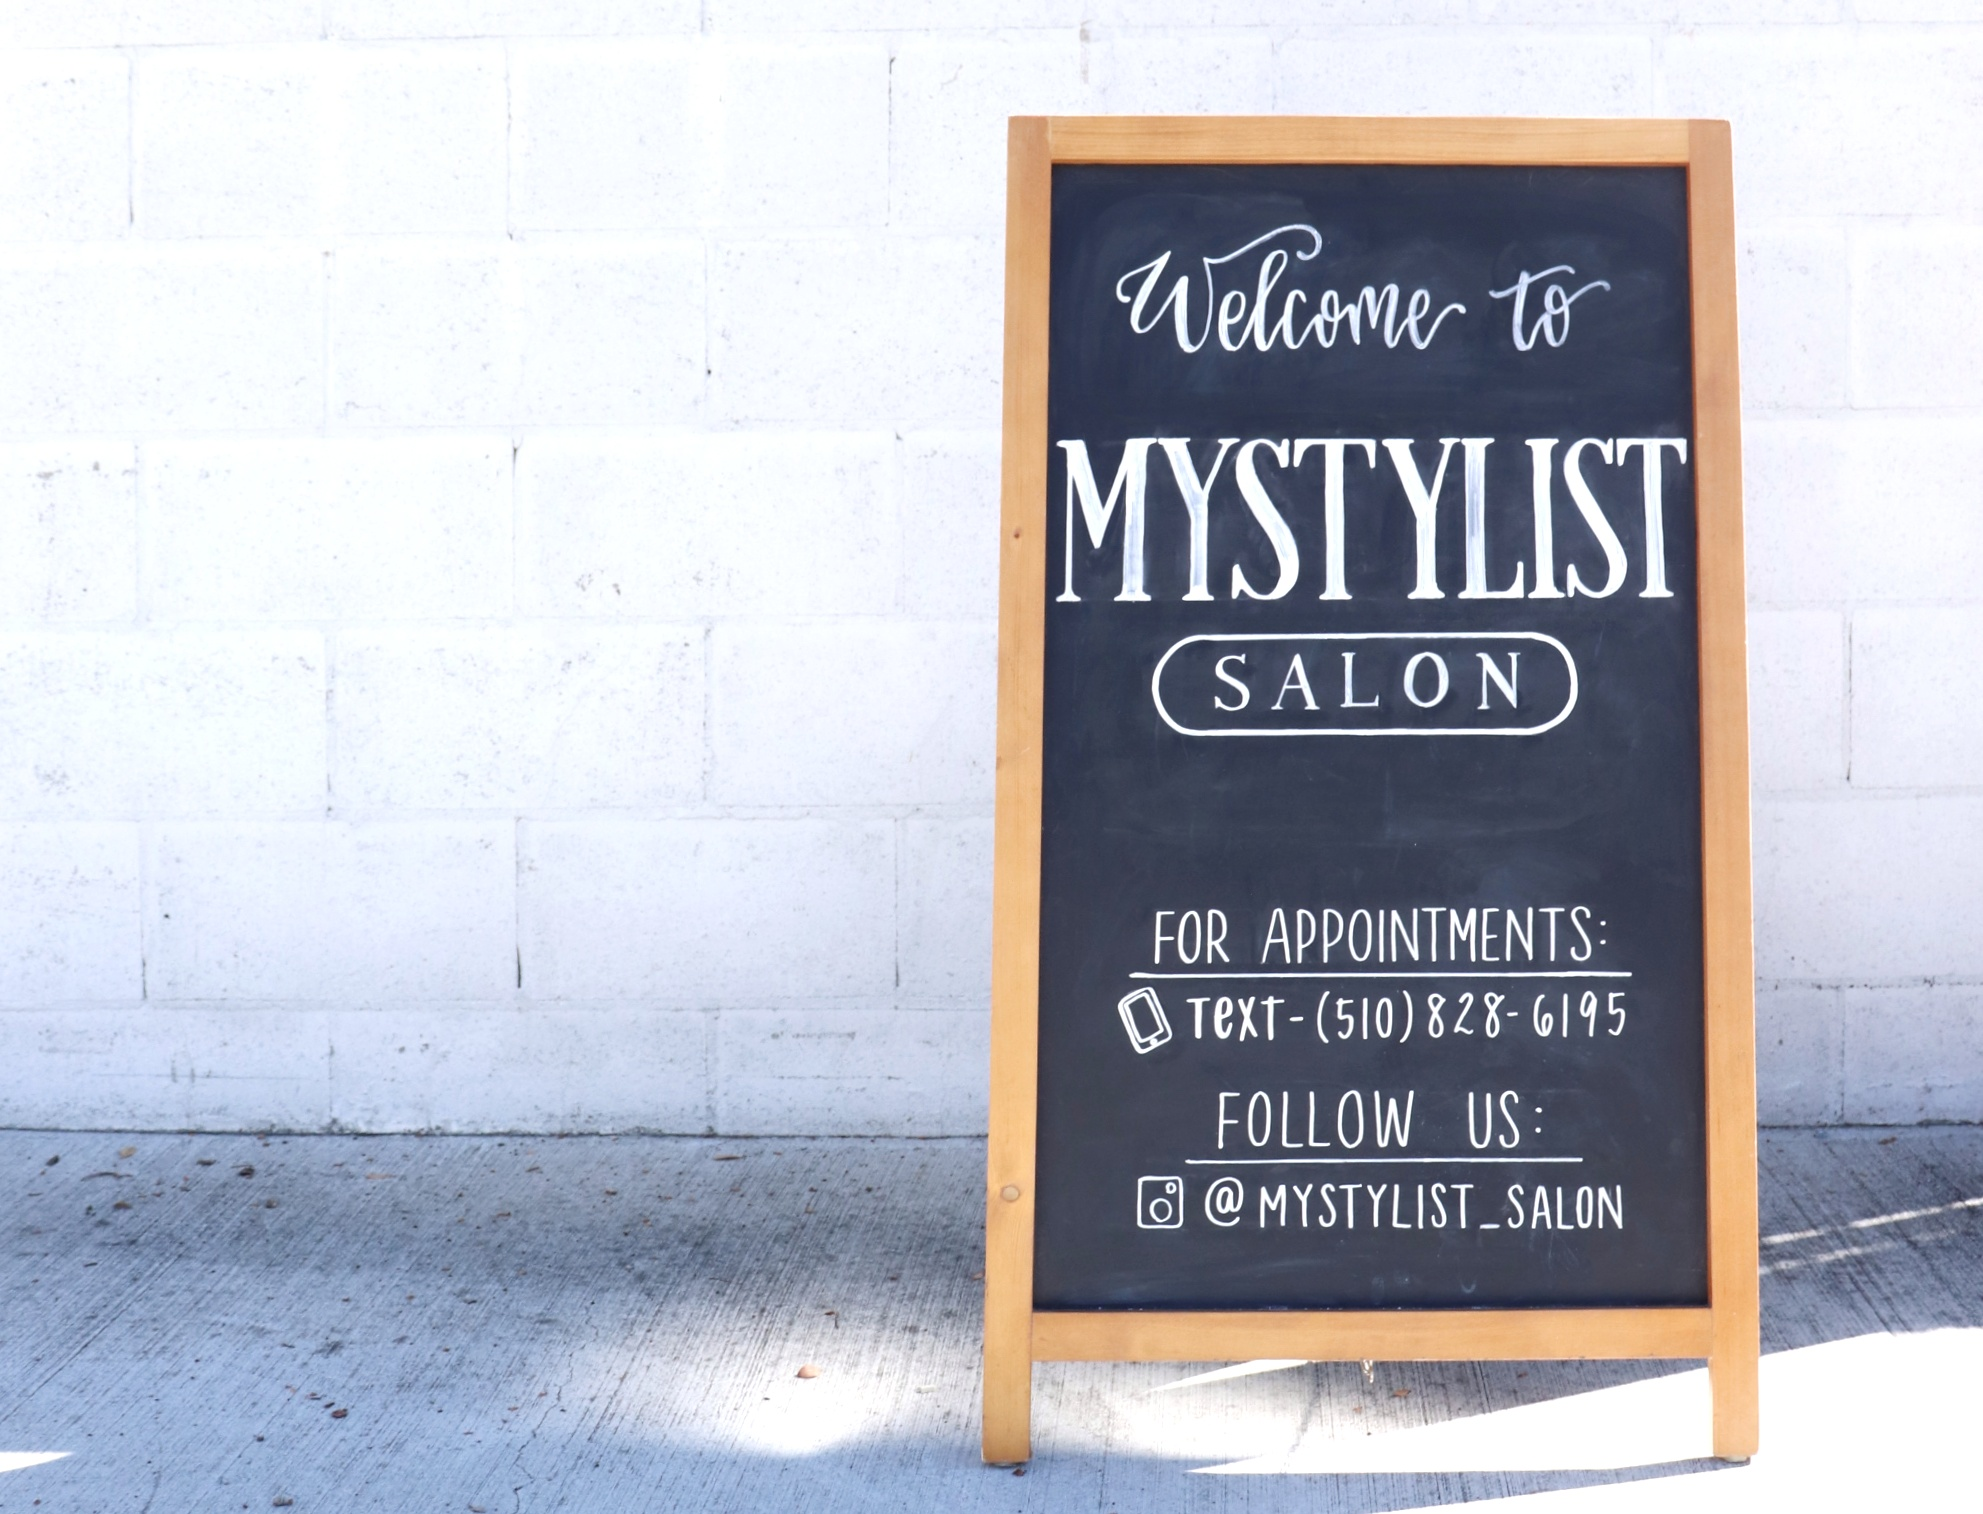 My Stylist Salon - Chalk Signage